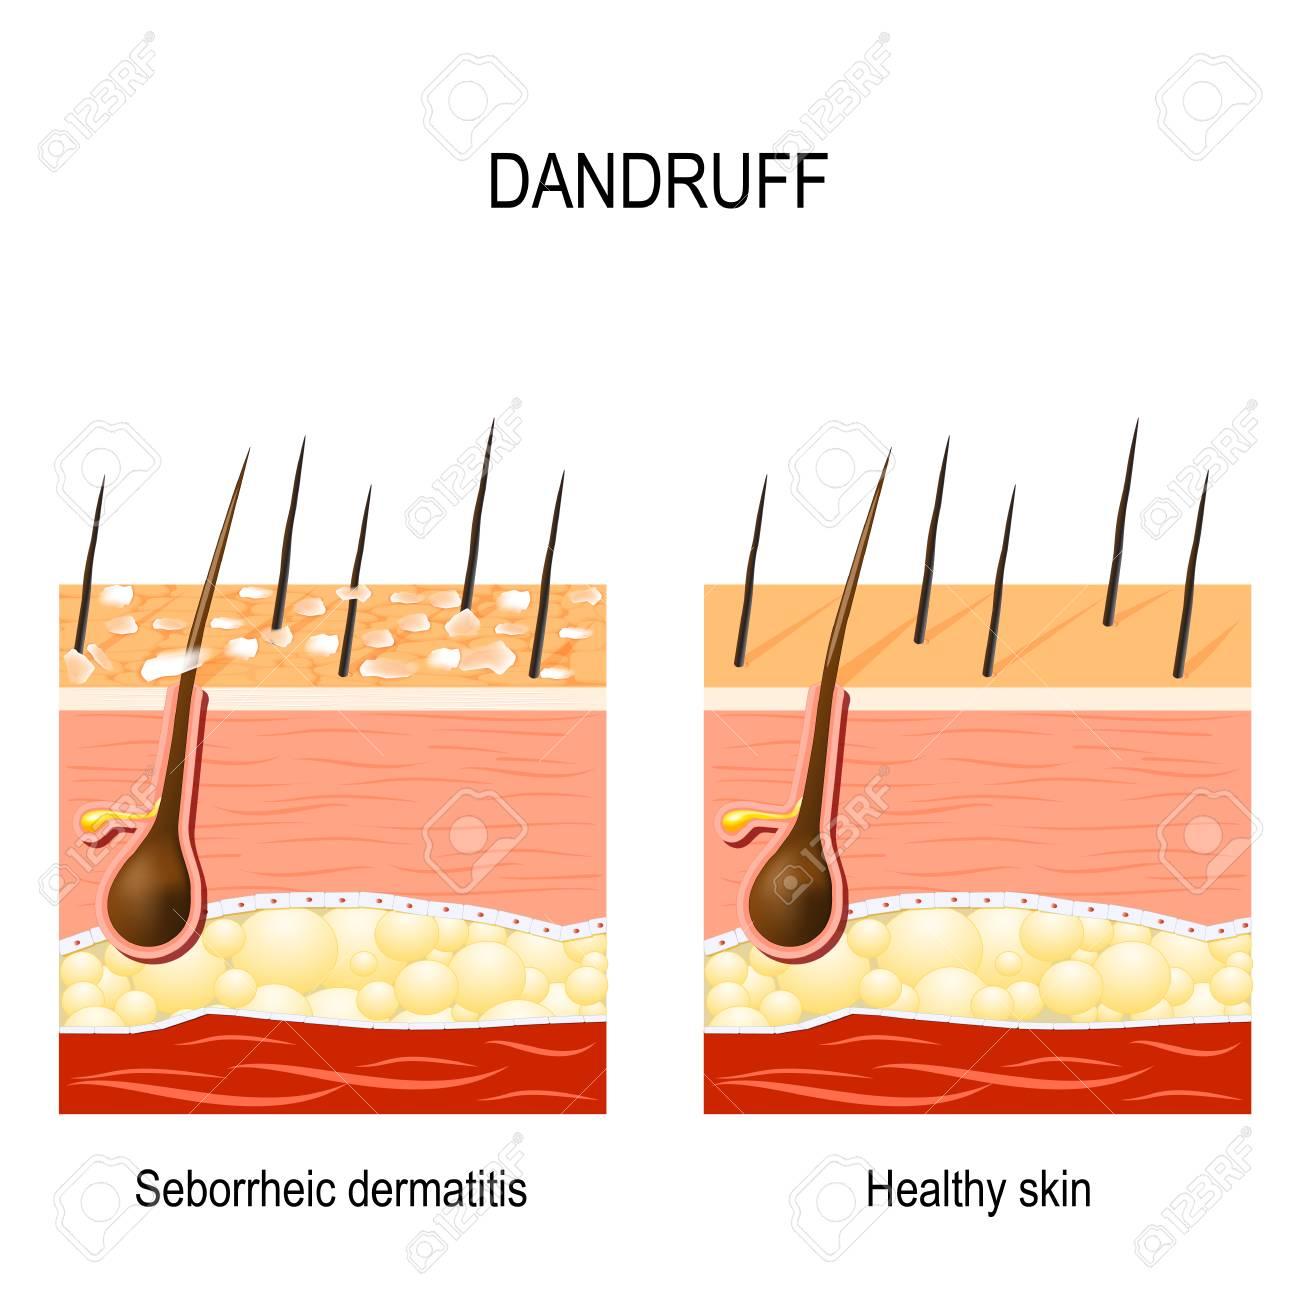 Dandruff  seborrheic dermatitis can occur due to dry skin, bacteria